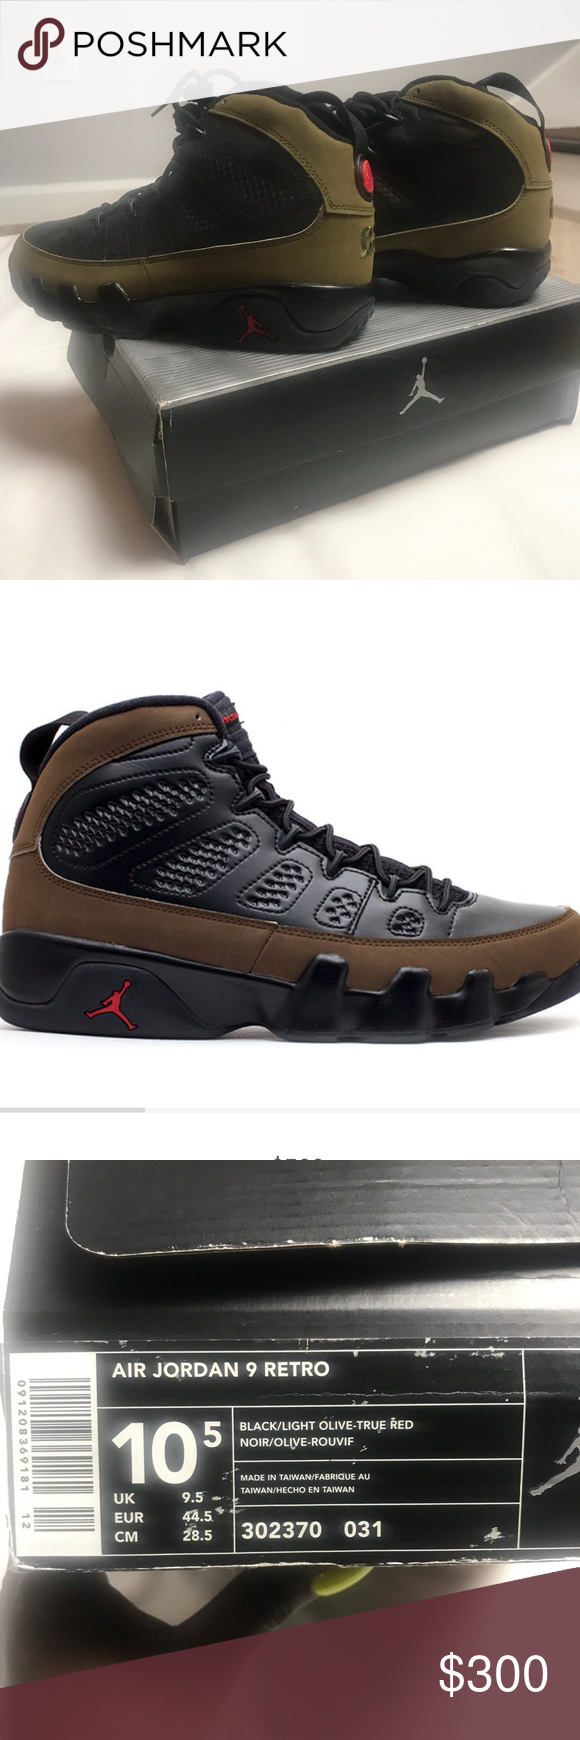 59d71fd5f6 Nike   Air Jordan 9 Retro Sz. 10.5 Black/Olive/Red Nike Air Jordan 9 ...